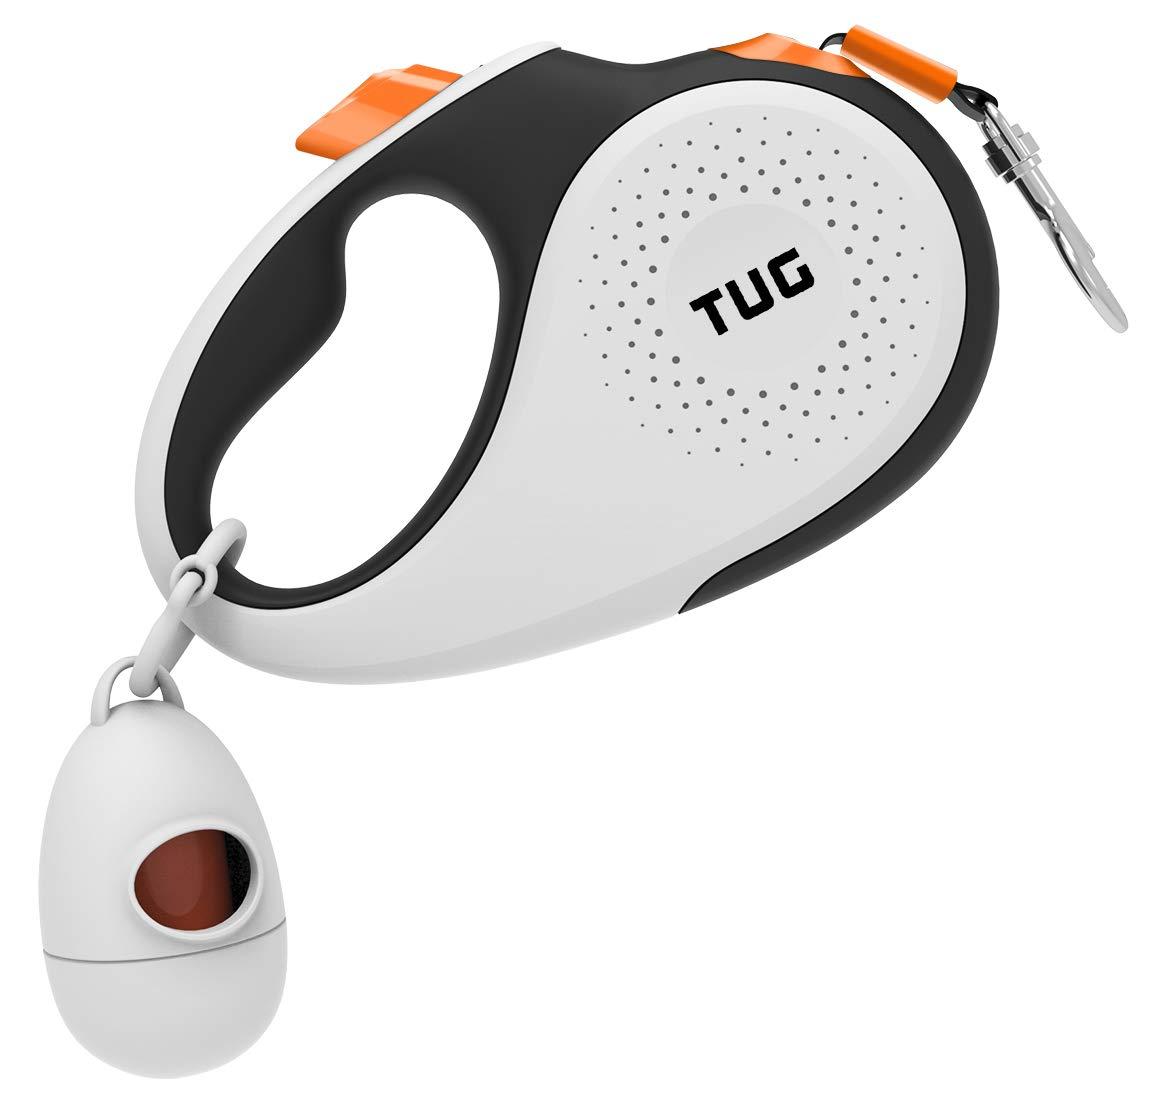 TUG Medium White/Orange Dog Retractable Leash Kit ... by TUG